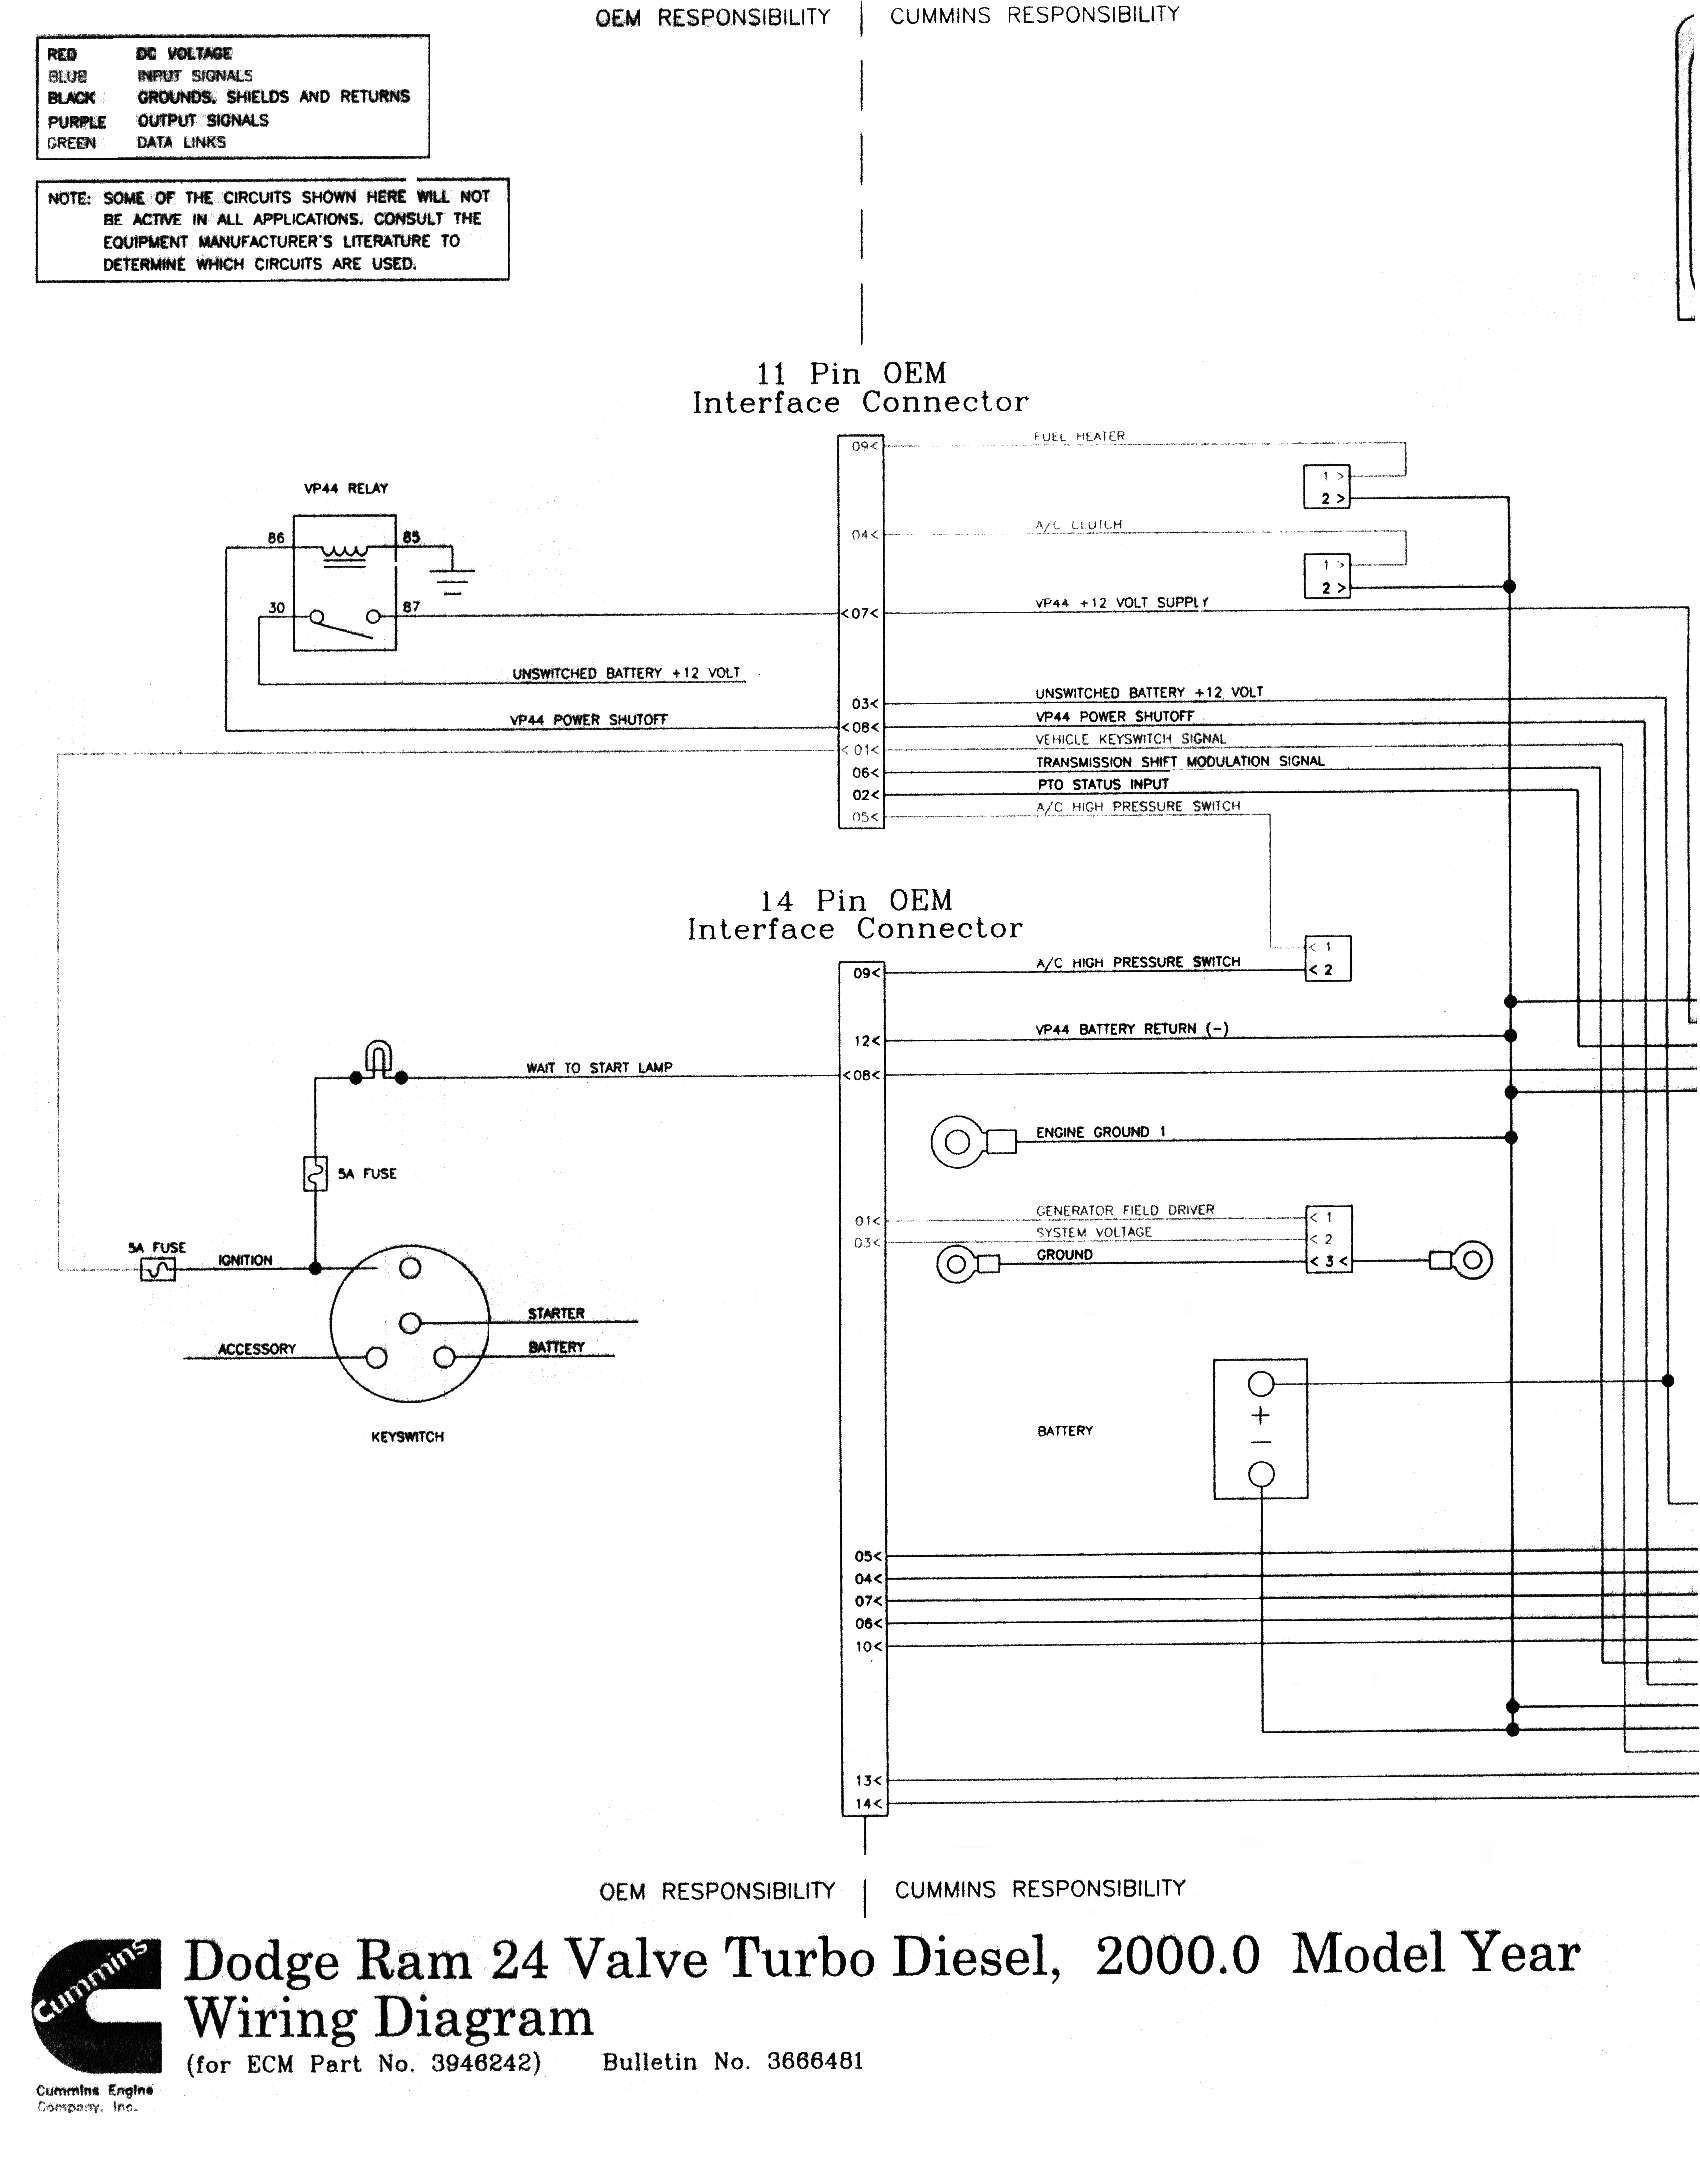 1998 Dodge Ram Wiring Diagram Dodge Ram Oem Parts Diagram